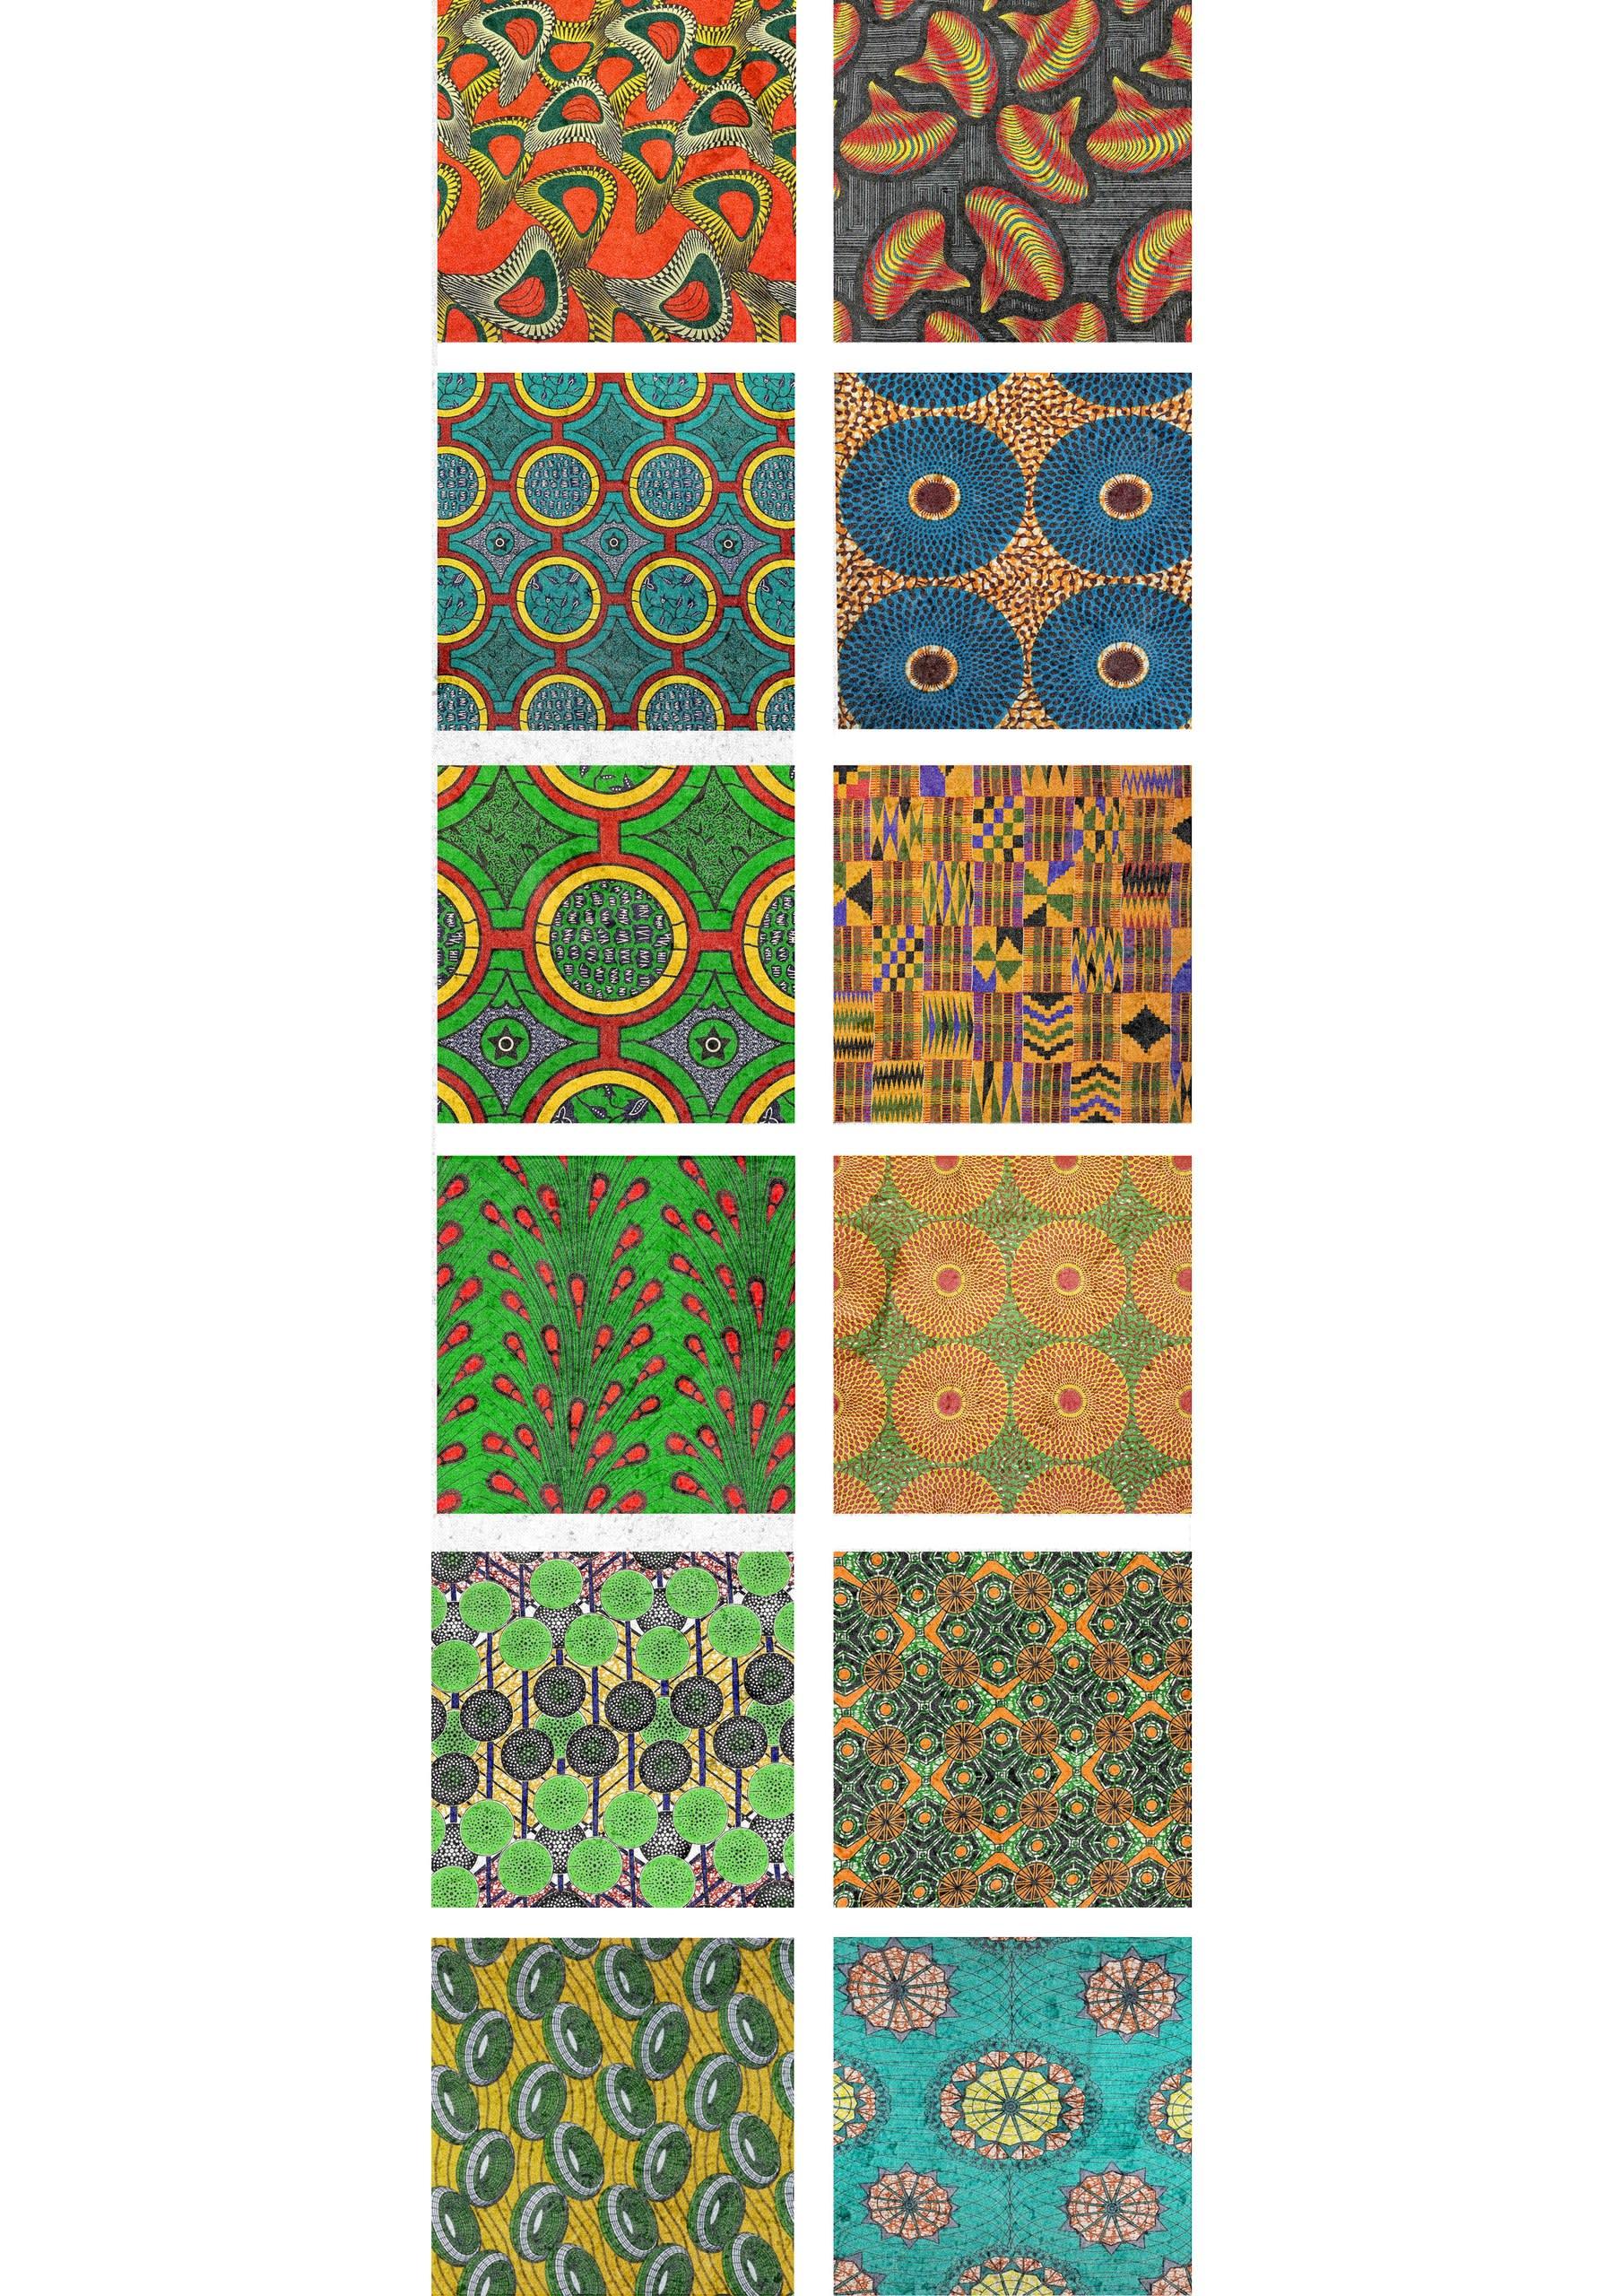 Kente - African cloth designs